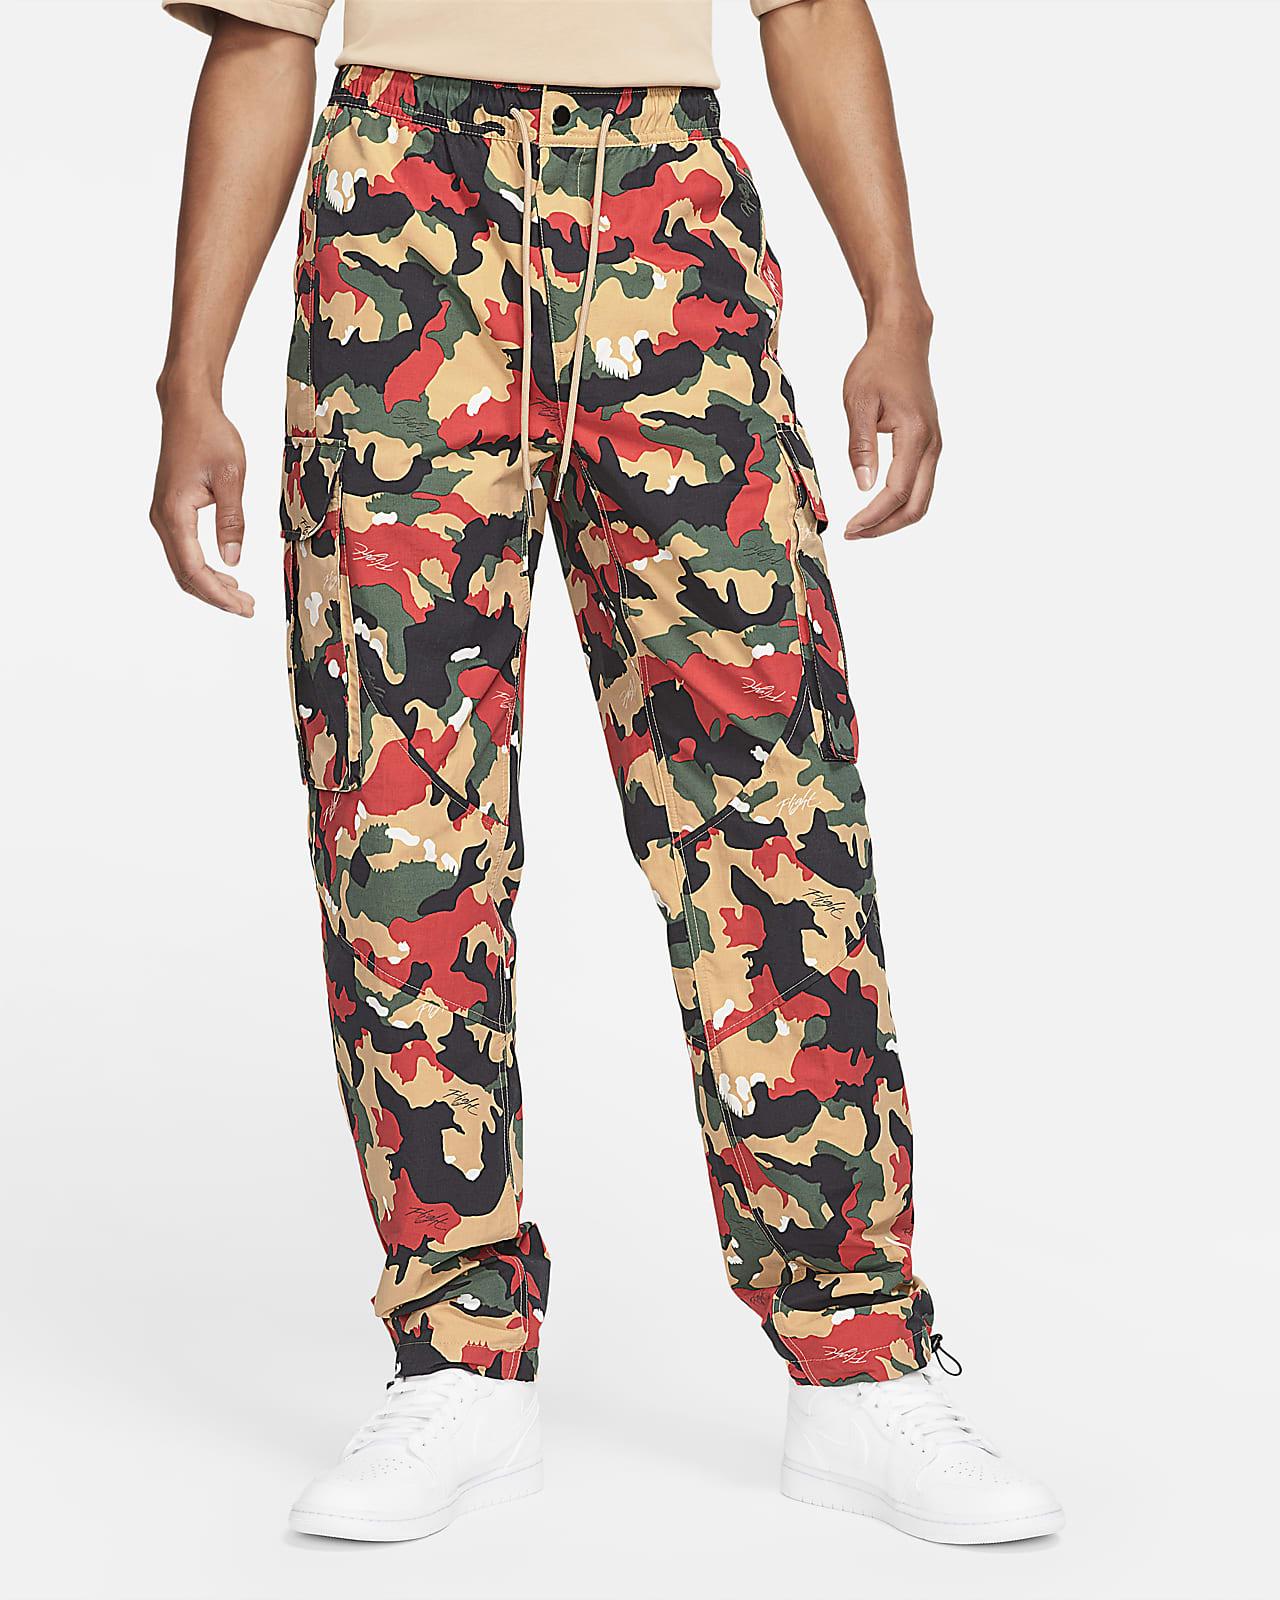 Jordan Flight Heritage Men's Cargo Trousers